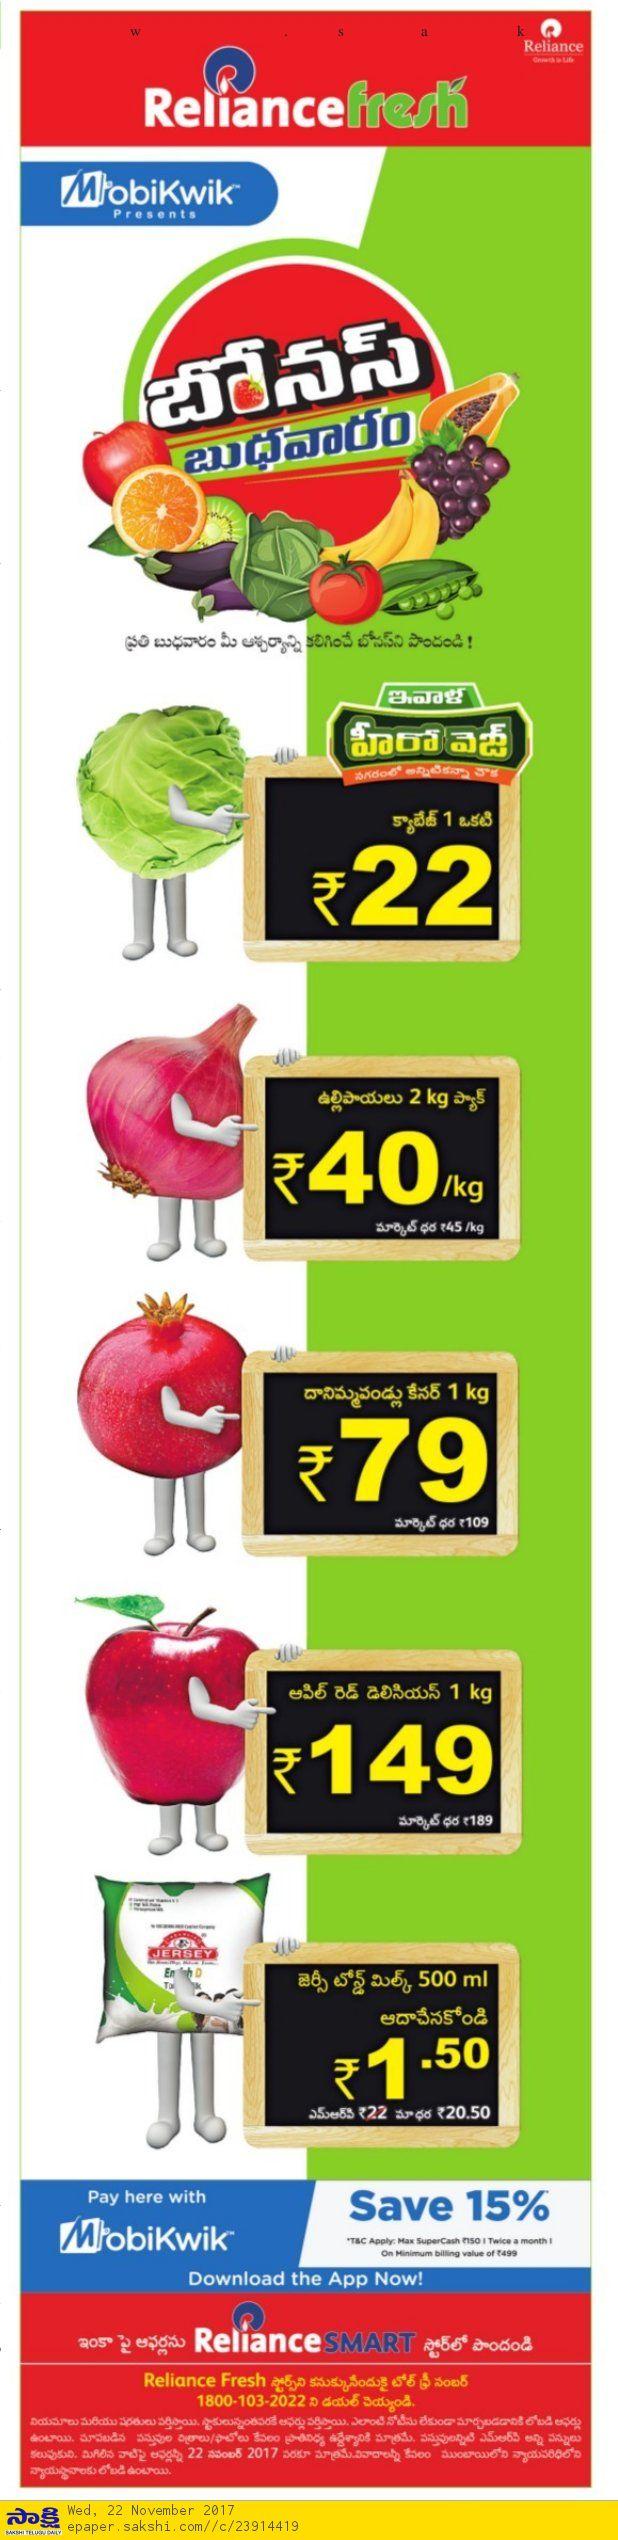 Reliance fresh chennai online shopping